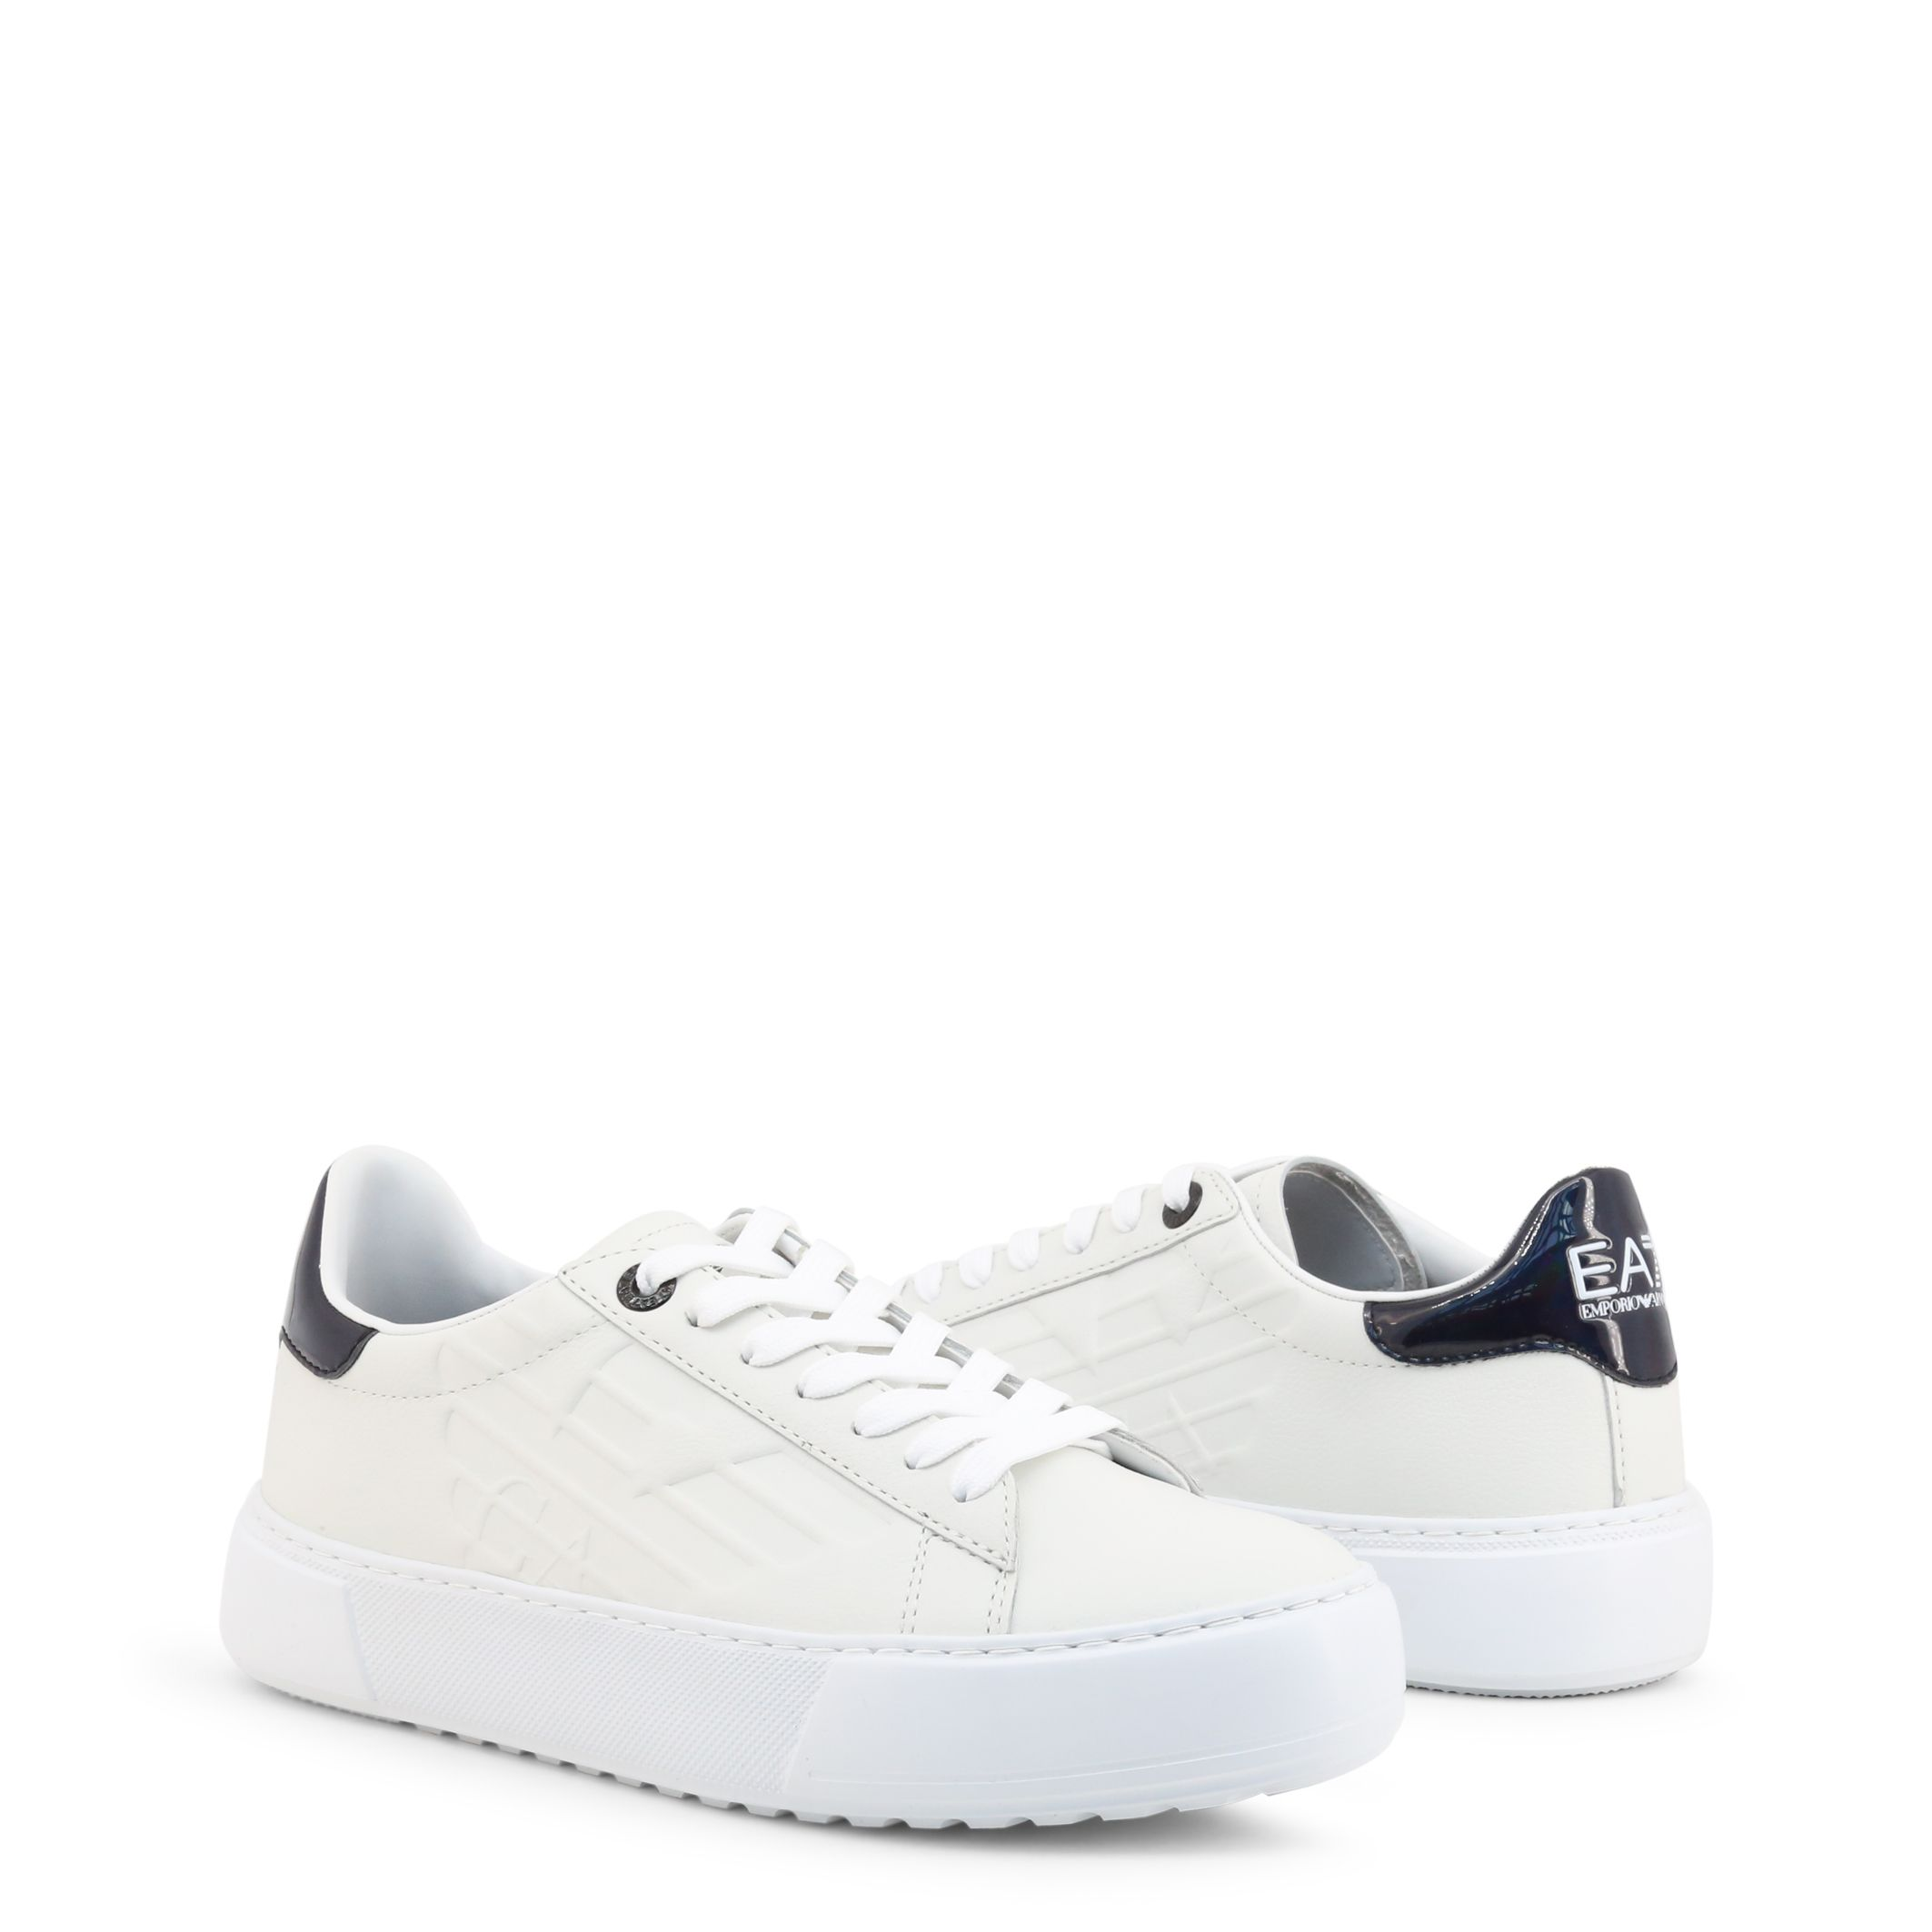 Shoes EA7 – X8X003_XK003